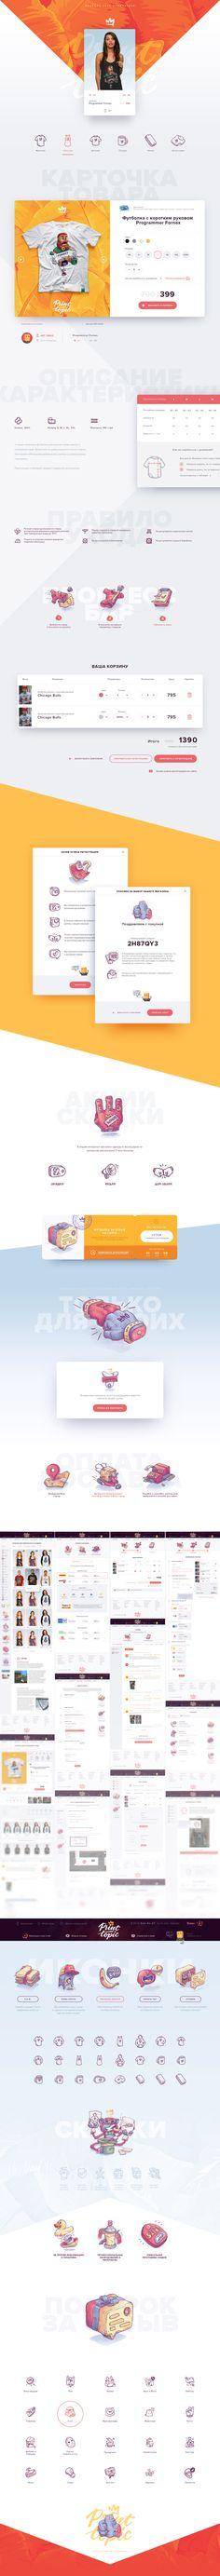 https://www.behance.net/gallery/32995681/Print-Topic-Shop-UI